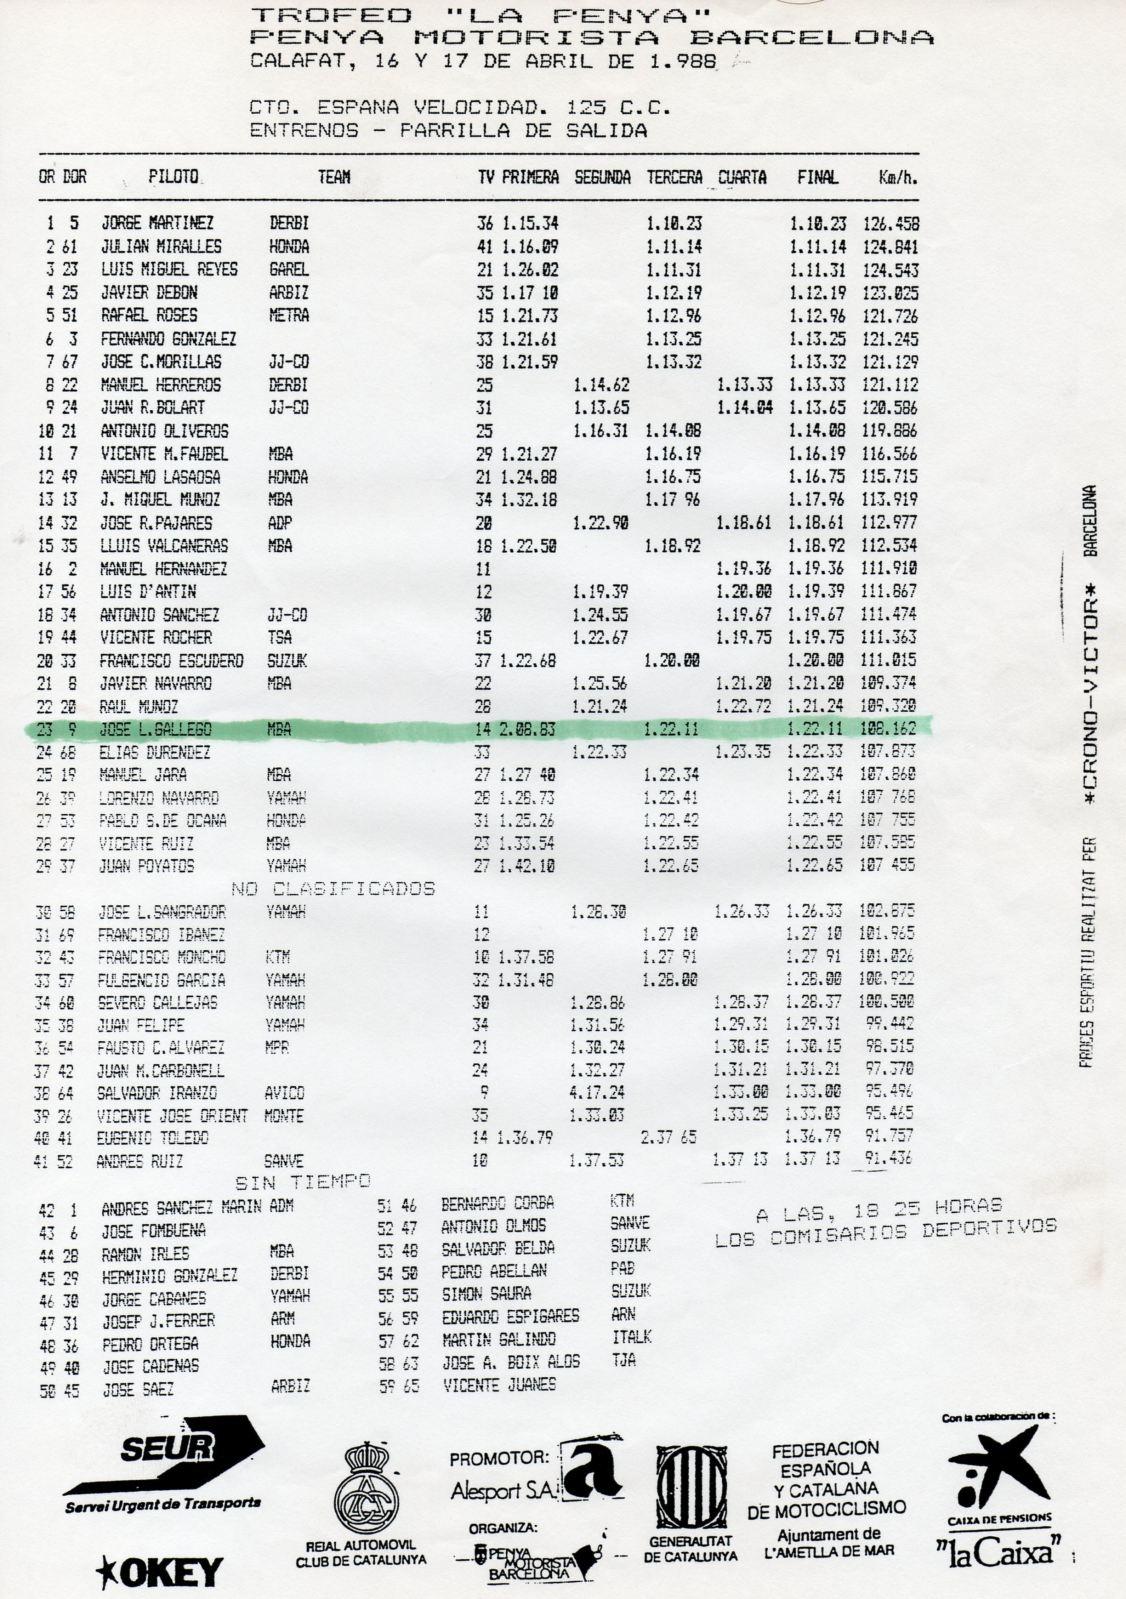 Antiguos pilotos: José Luis Gallego (V) M9azpx